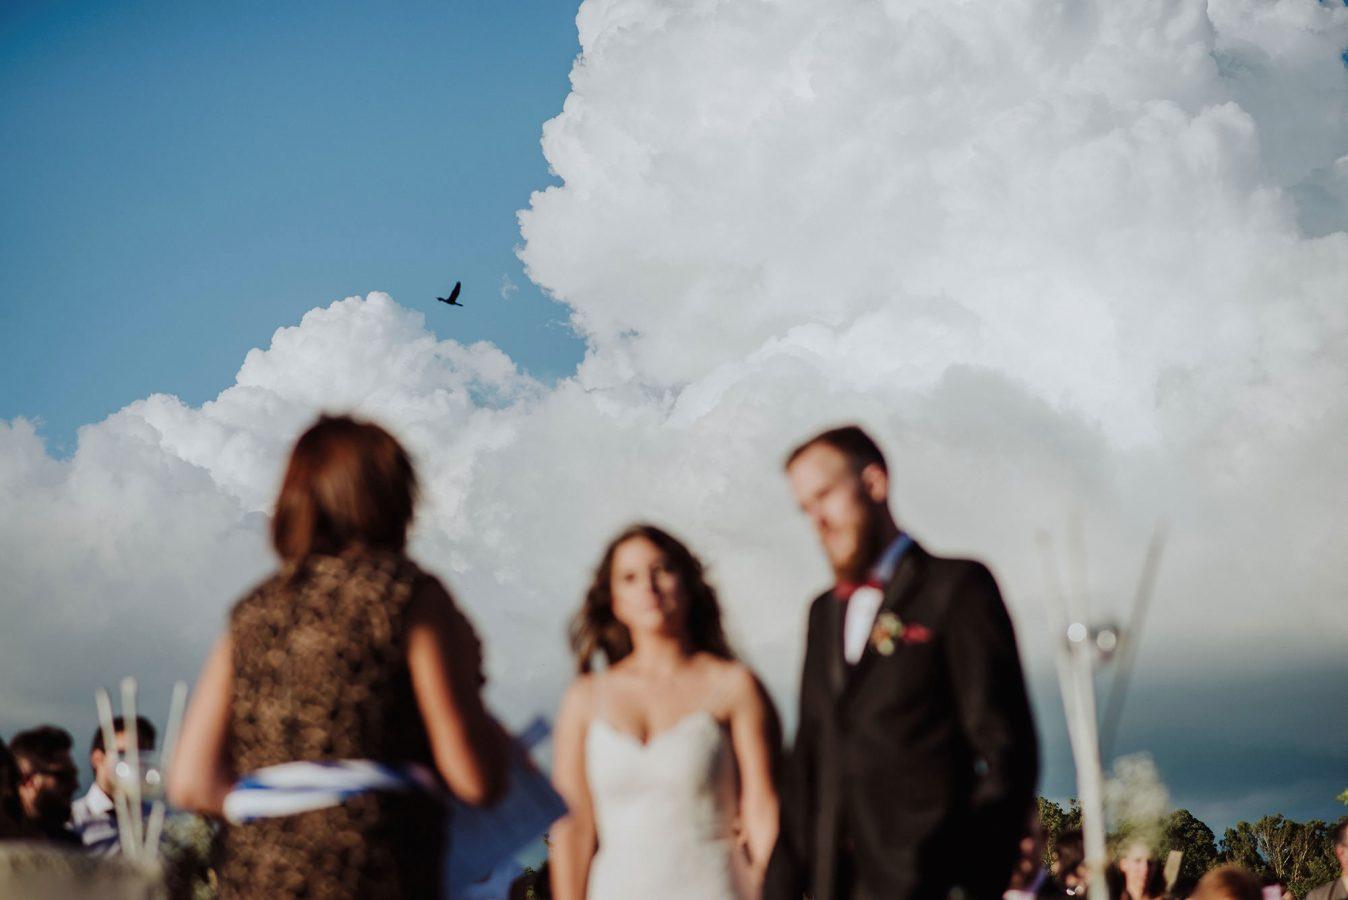 fotografos-de-boda-uruguay-10